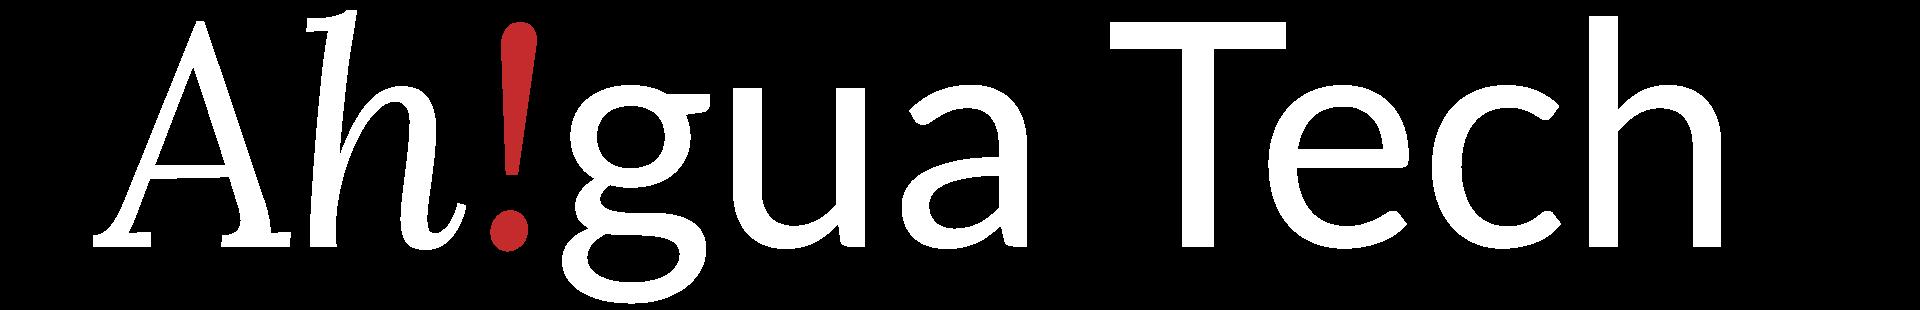 Ah!gua Tech Text Logo